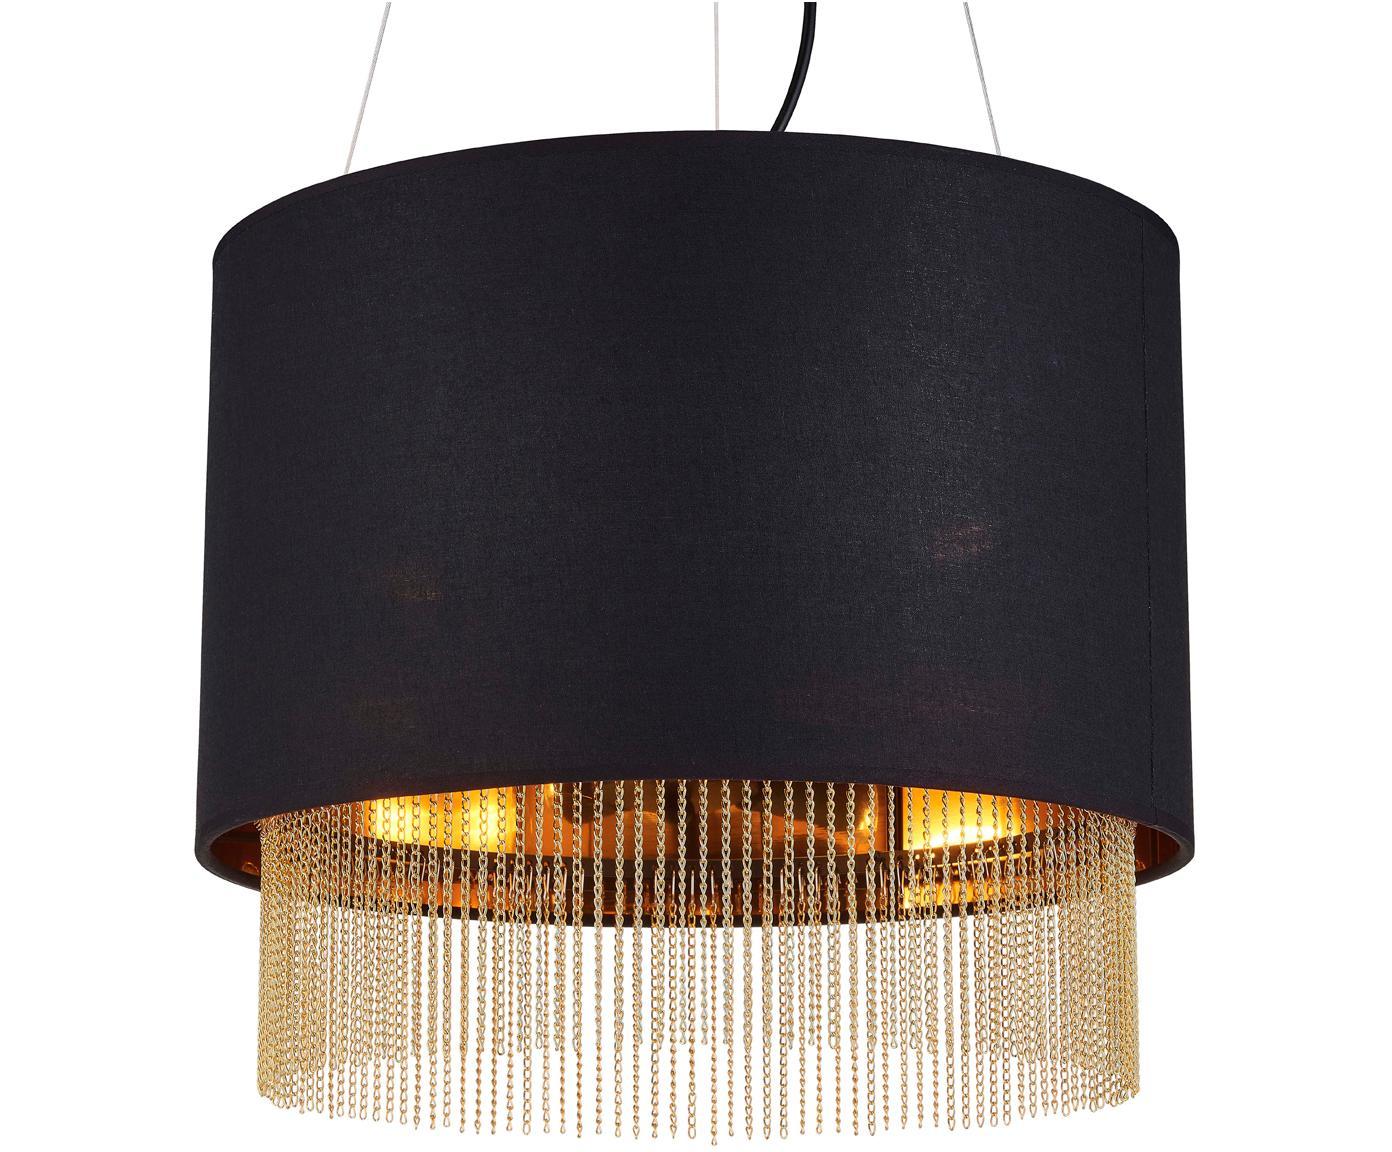 Hanglamp Fringe, Lampenkap: textiel, Zwart, goudkleurig, Ø 40 x H 34 cm